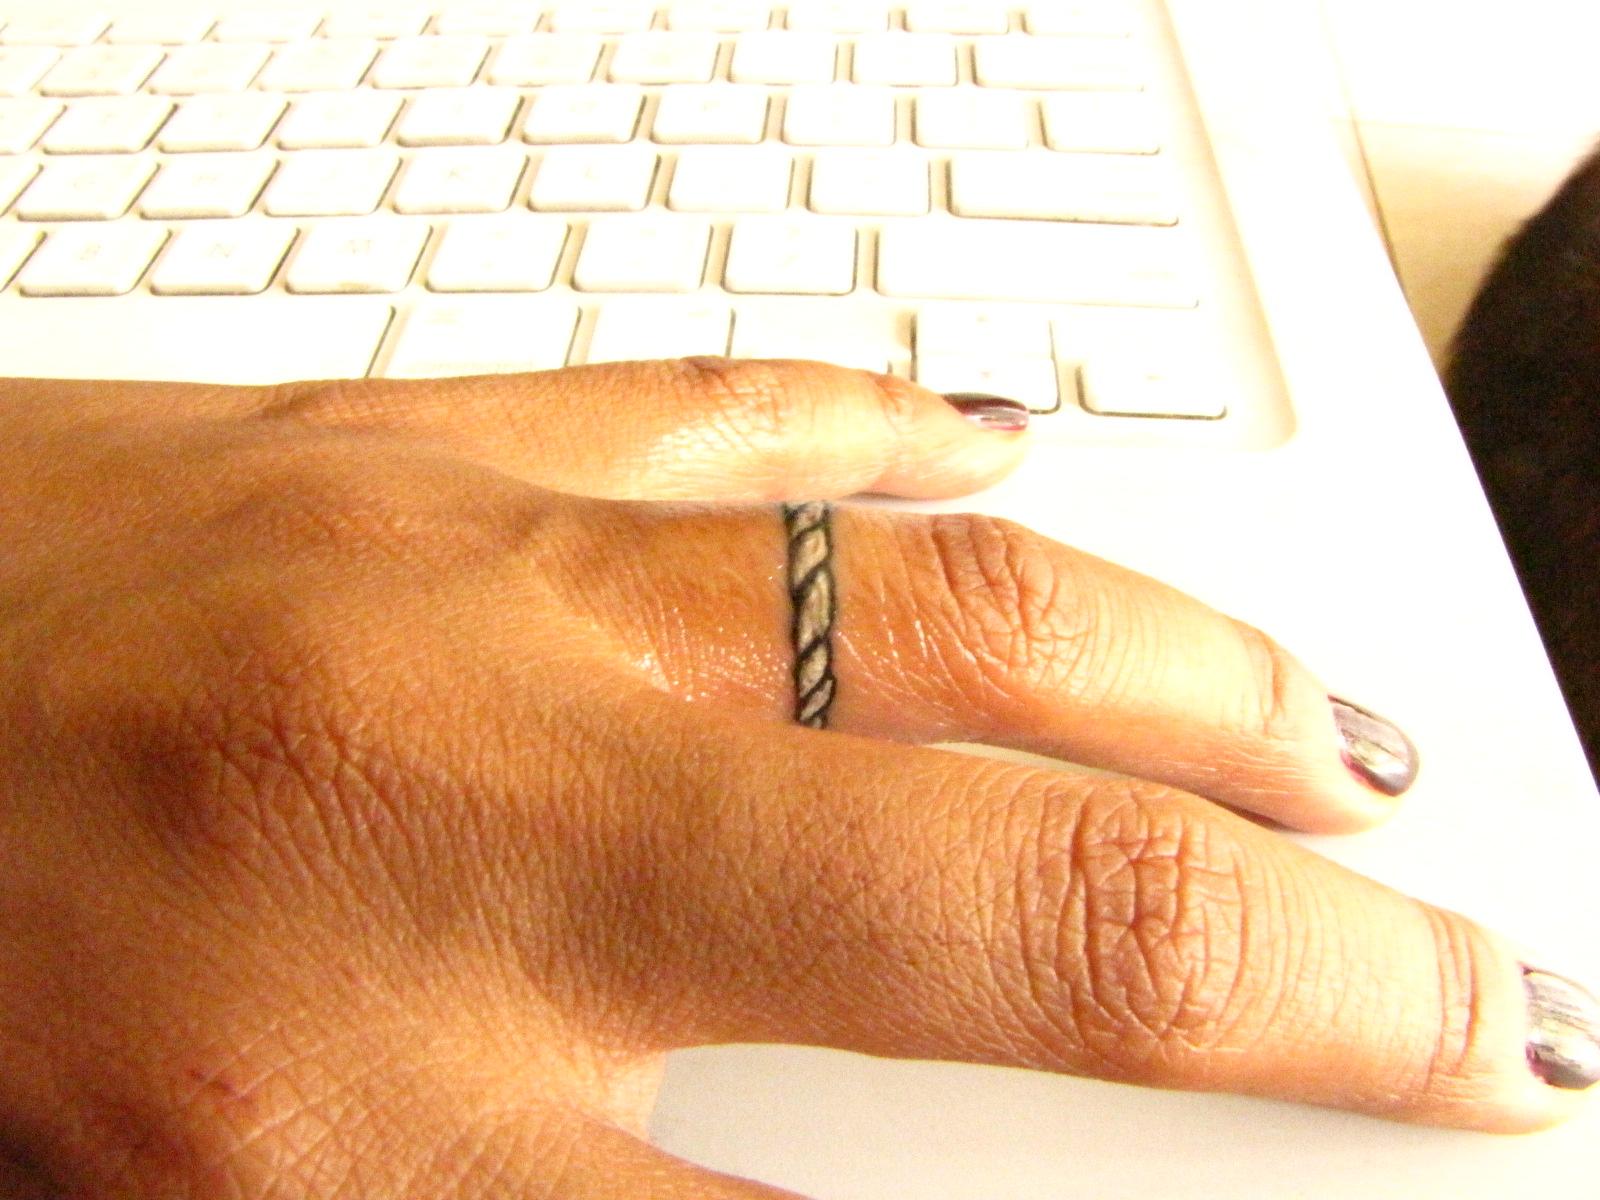 The story of leilani shawn wedding ring tattoos 2 for Wedding ring tatoos